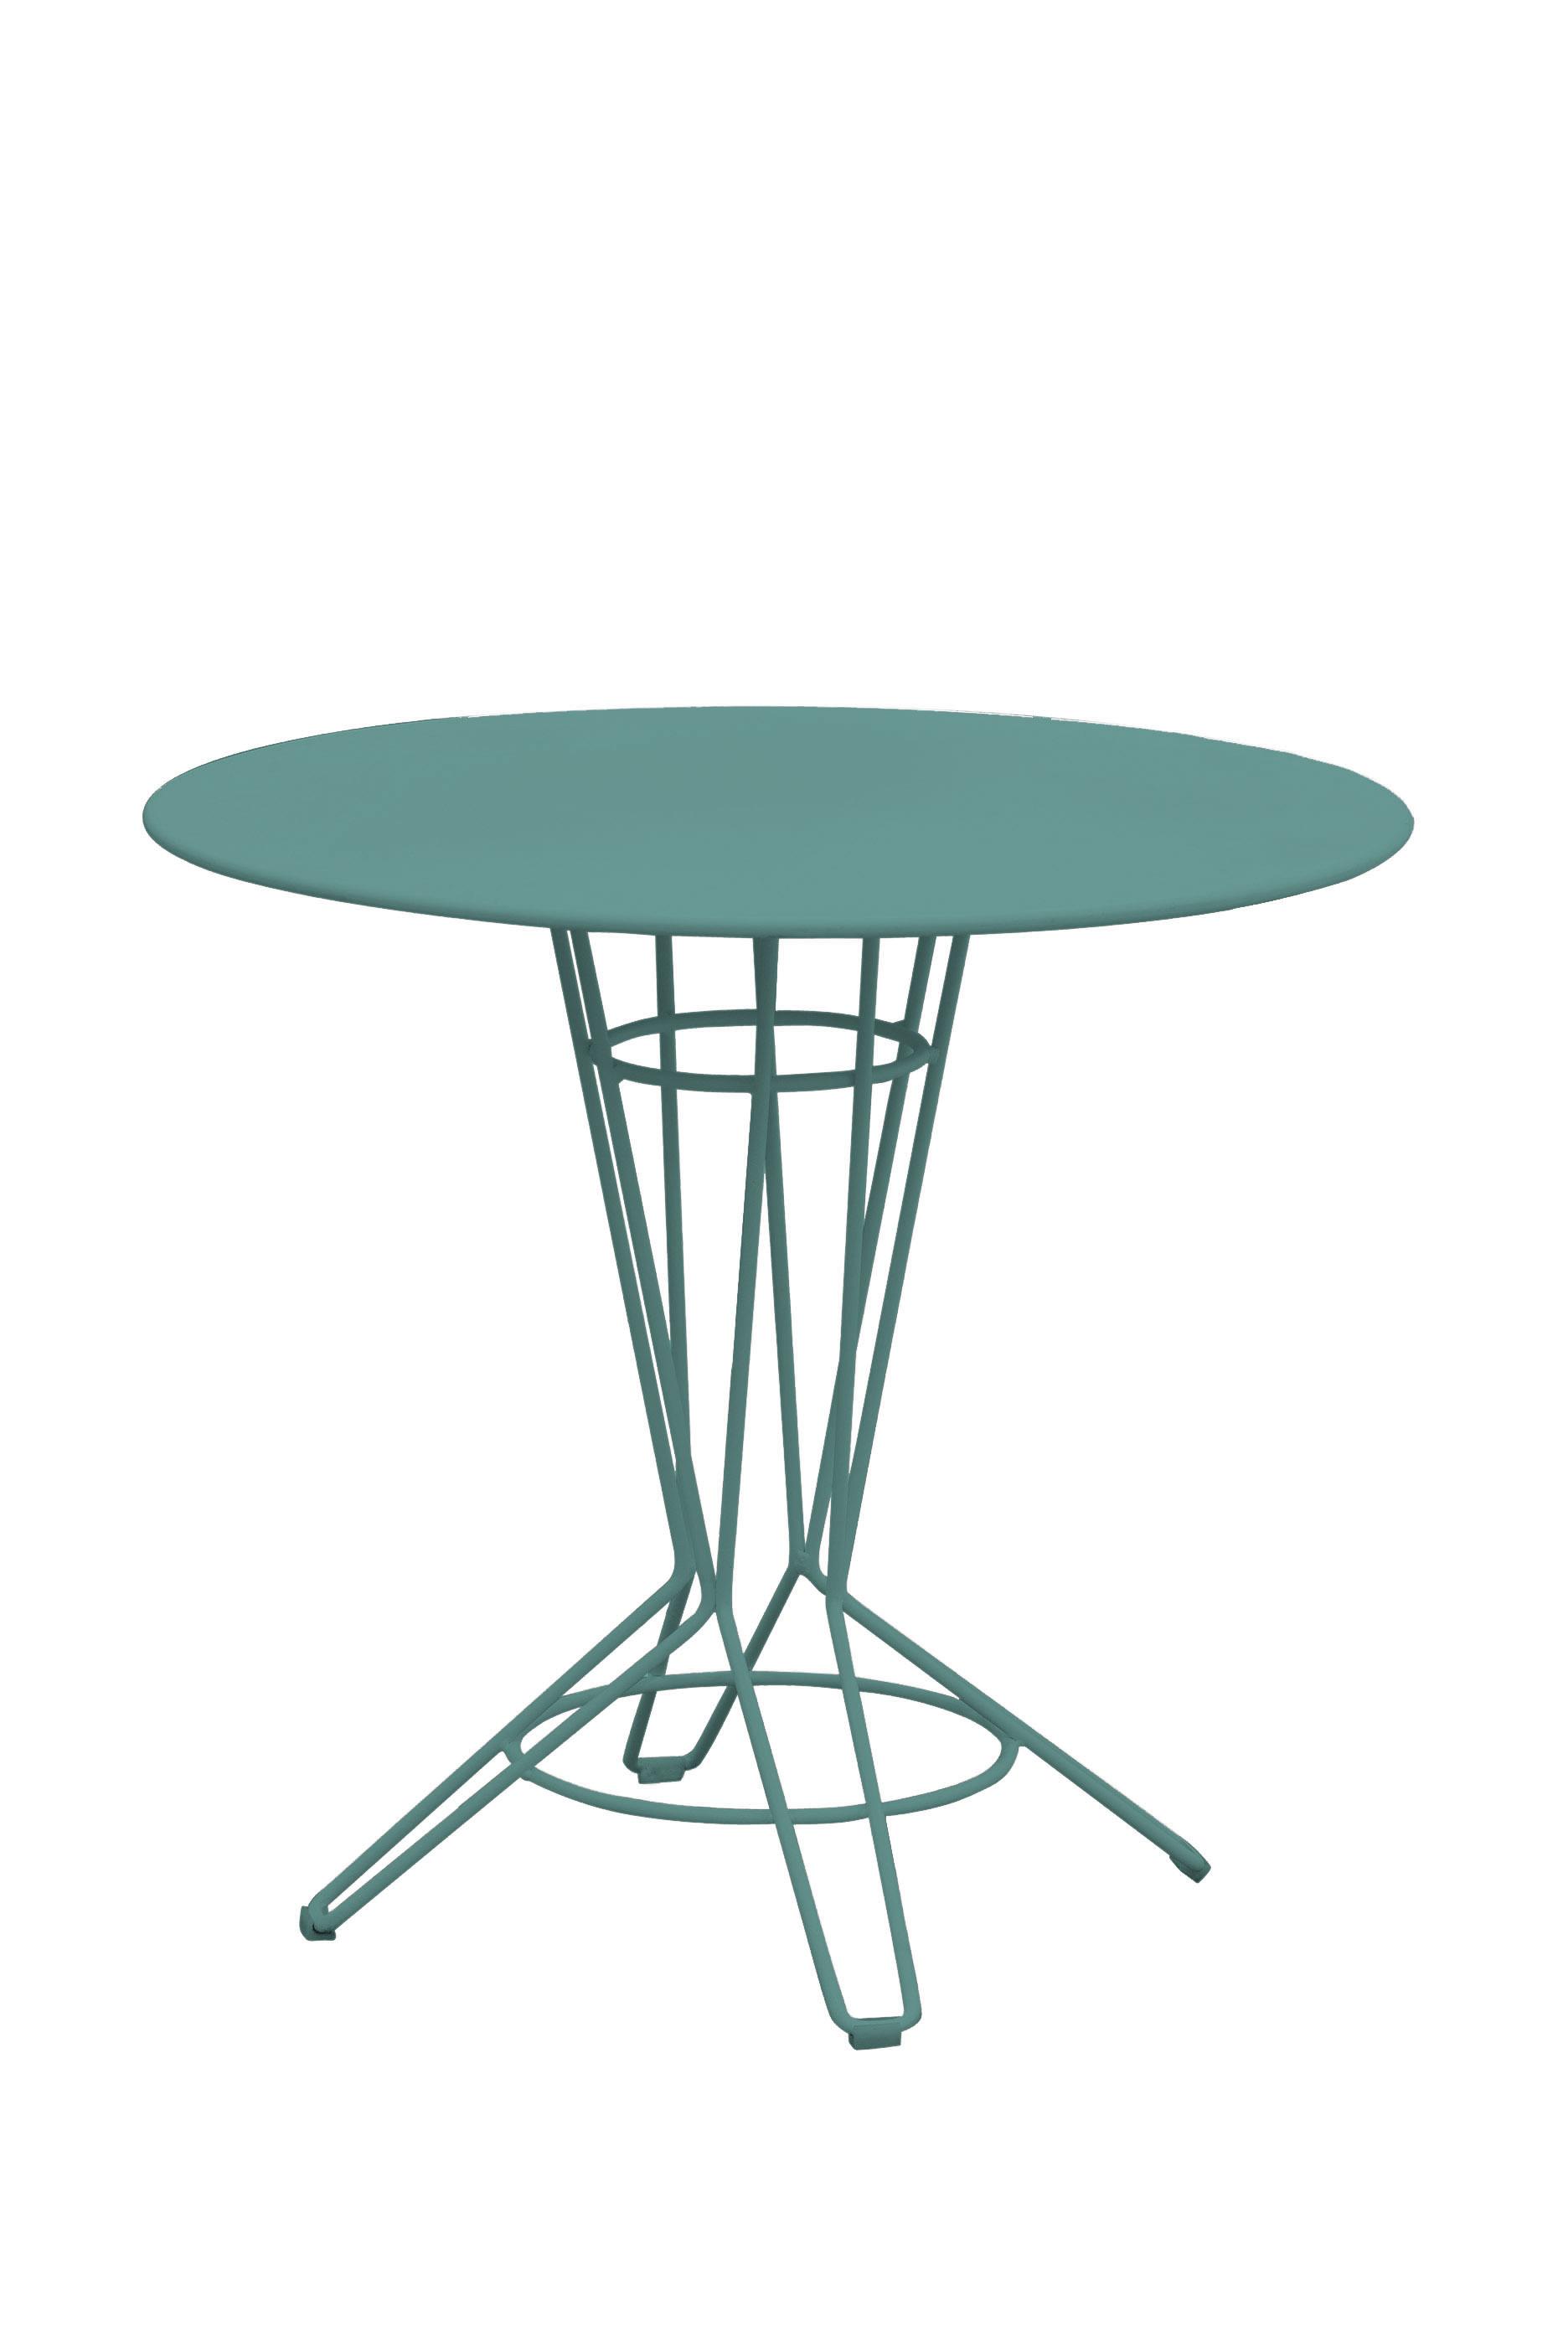 NOSTRUM - Table rond en acier vert émeraude D80